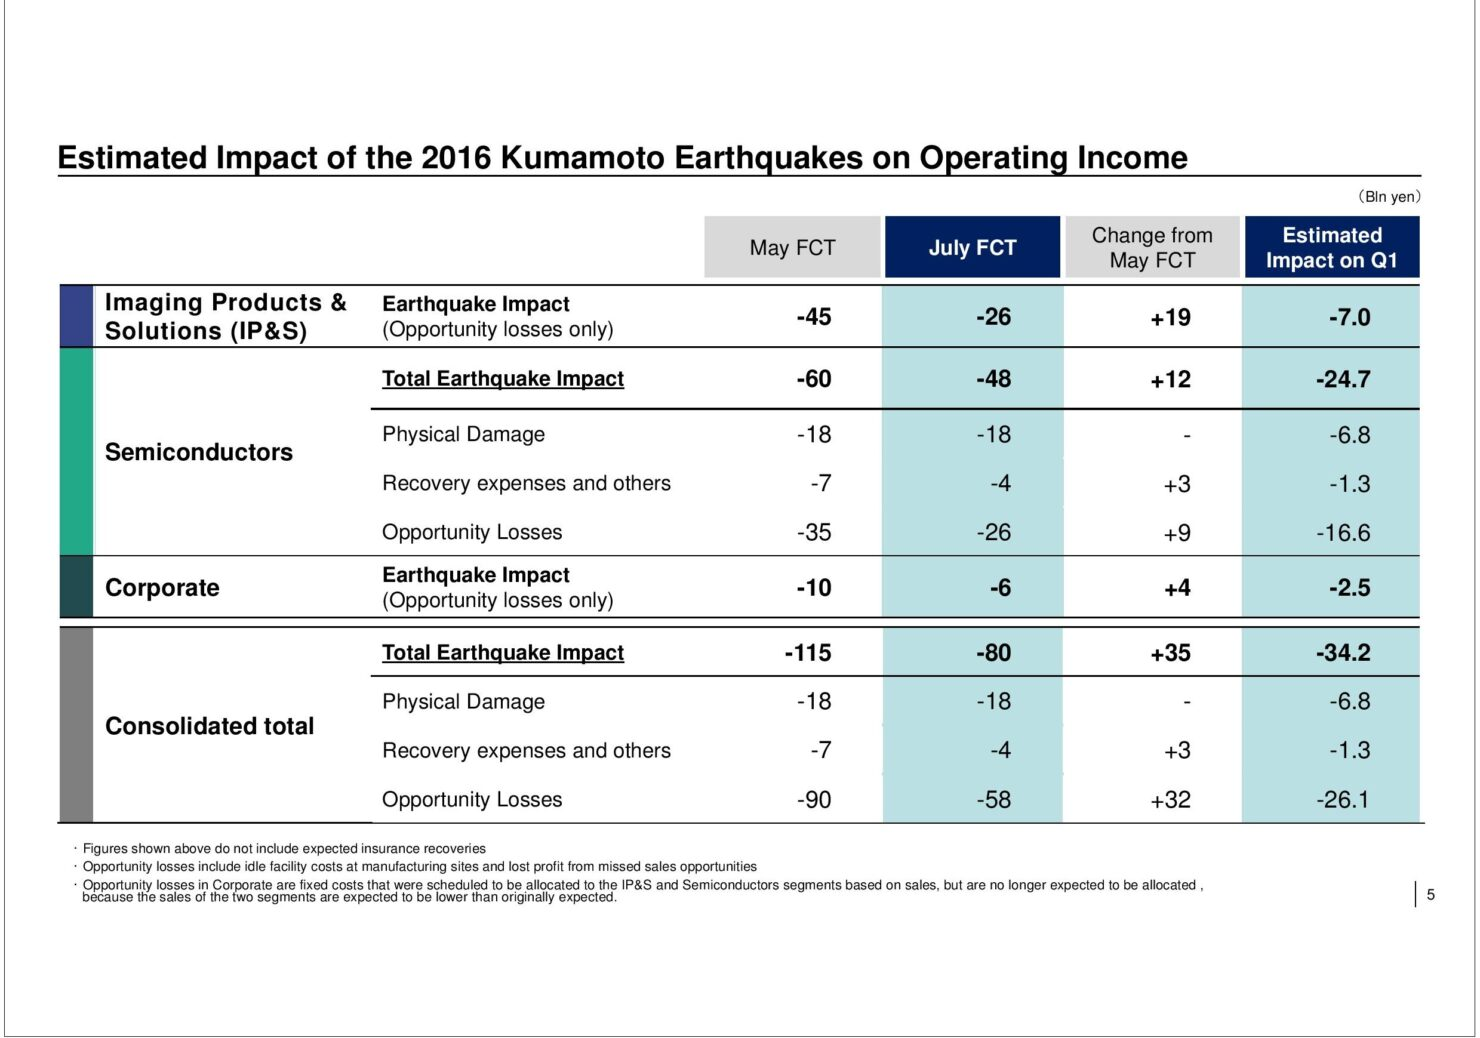 sony-q1-2016-earthquake-impact